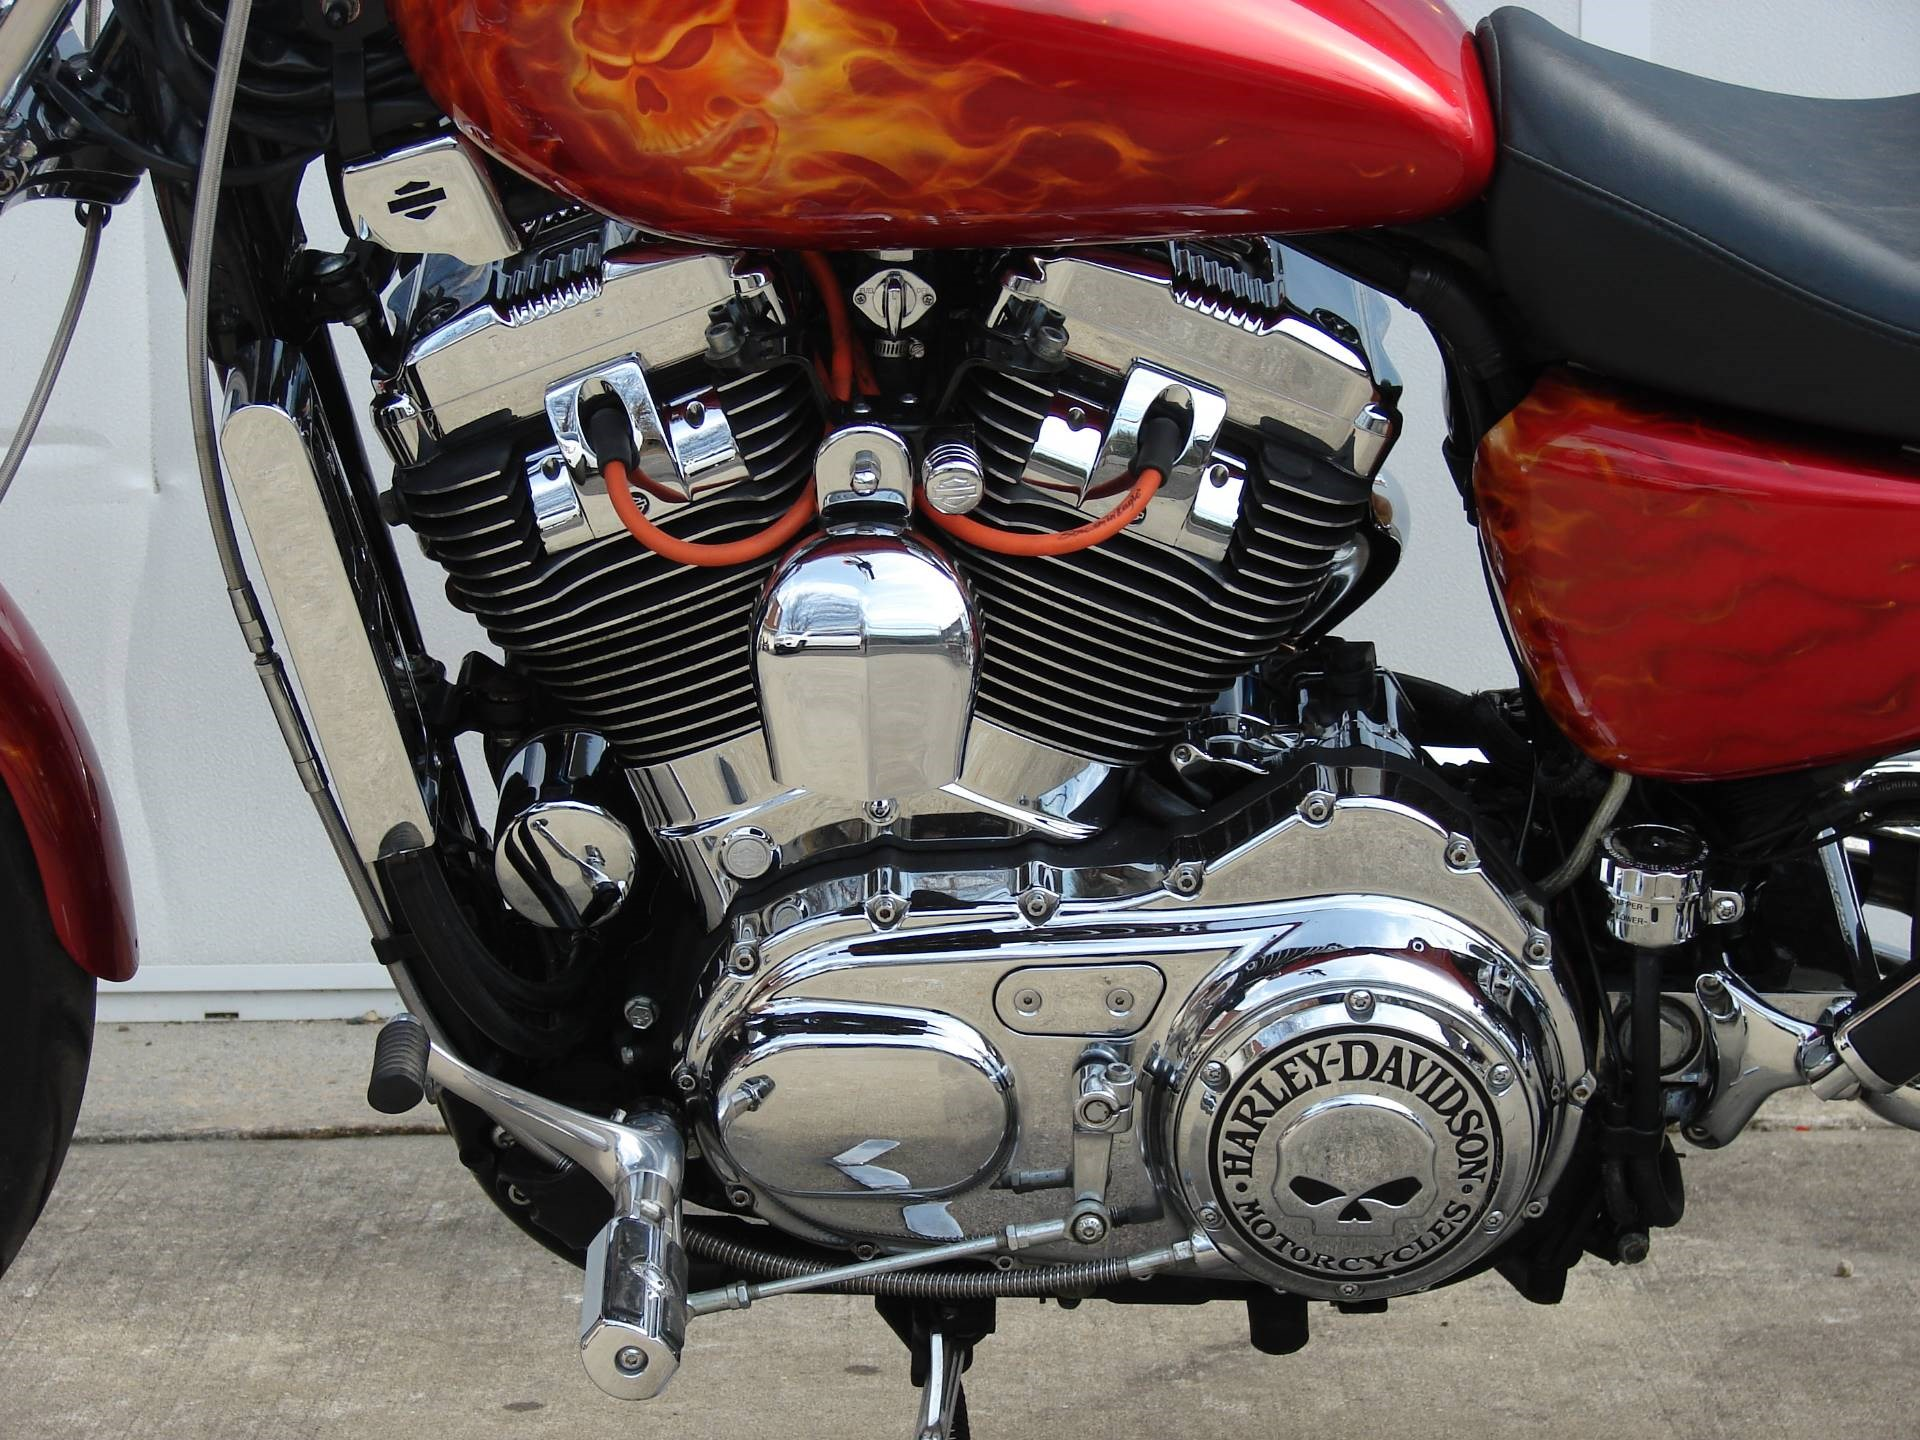 2005 Harley Davidson Xl1200c Sportster 1200 Custom Red